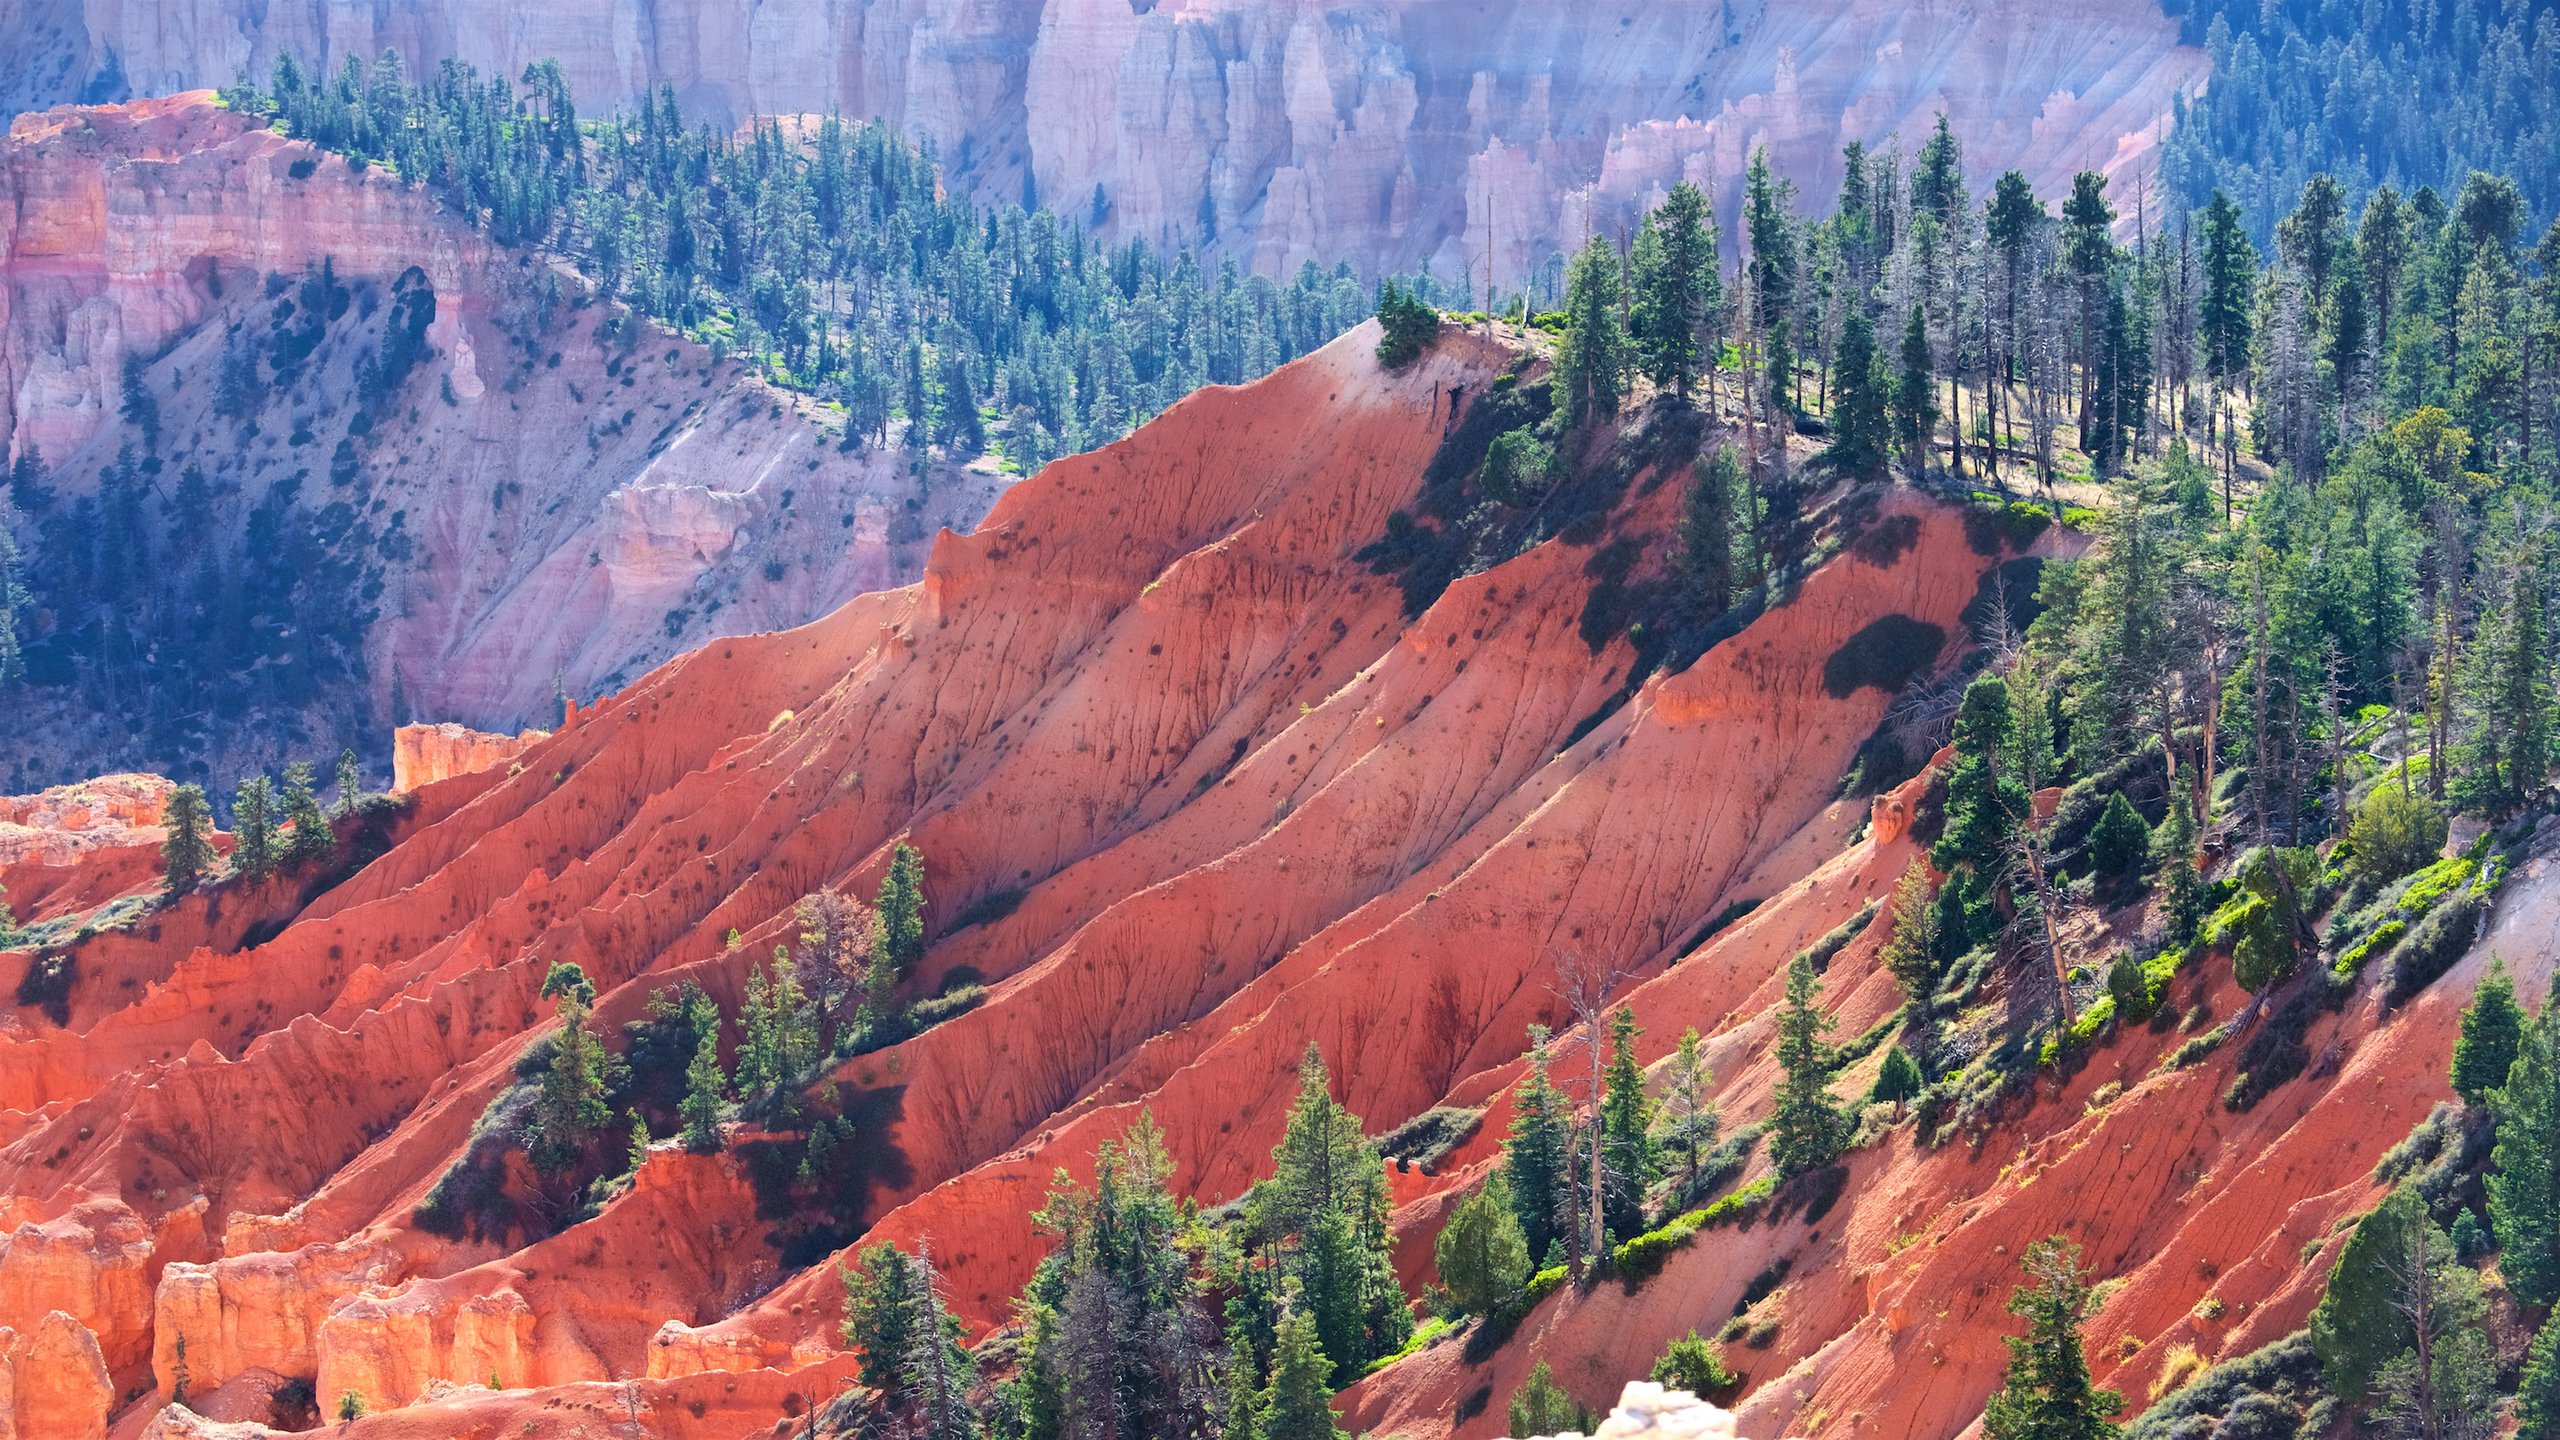 Kane County, Utah, United States of America